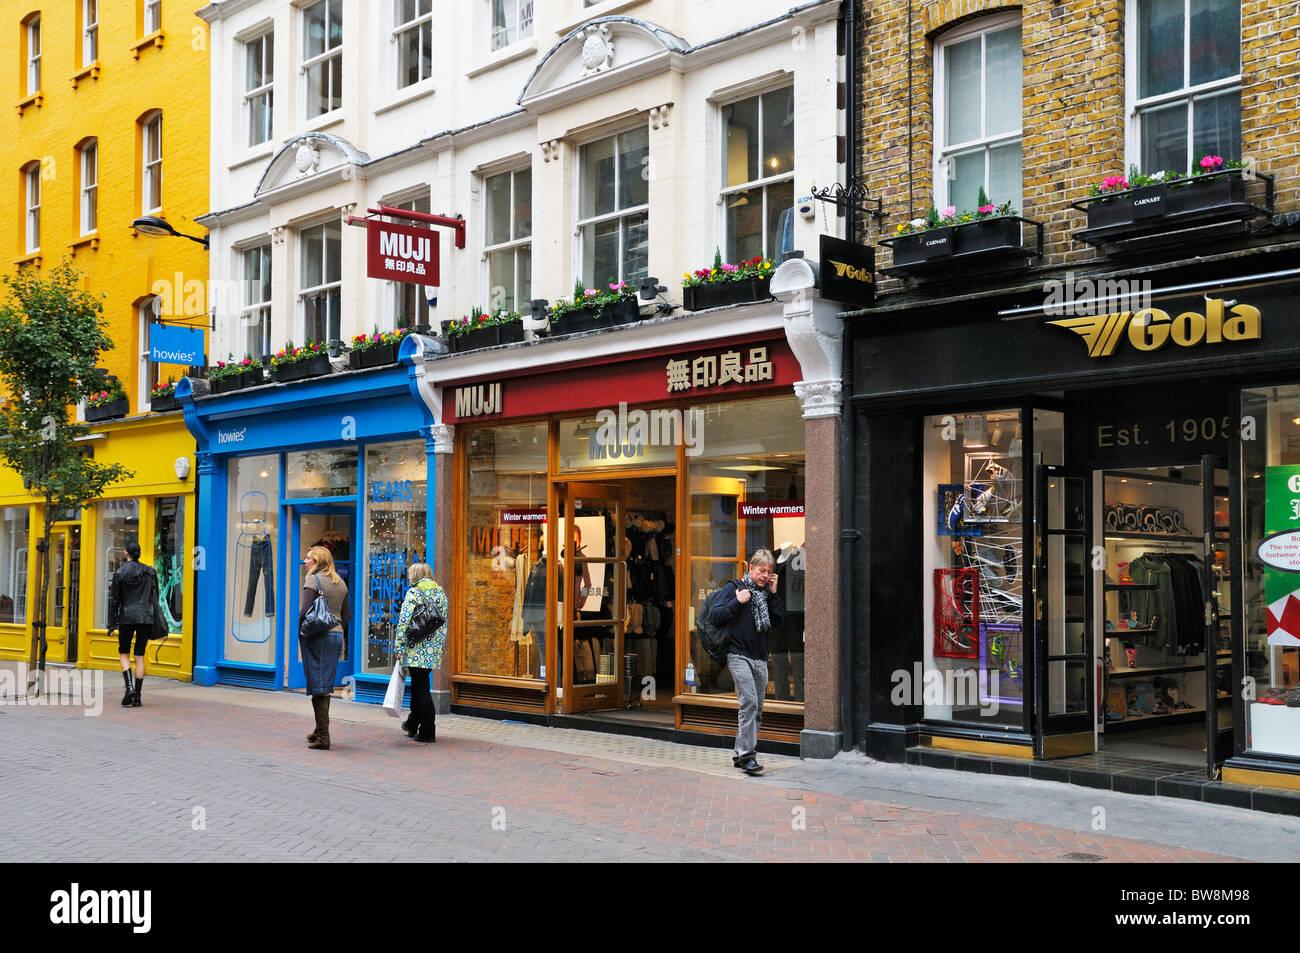 Carnaby Street, London, England, UK - Stock Image